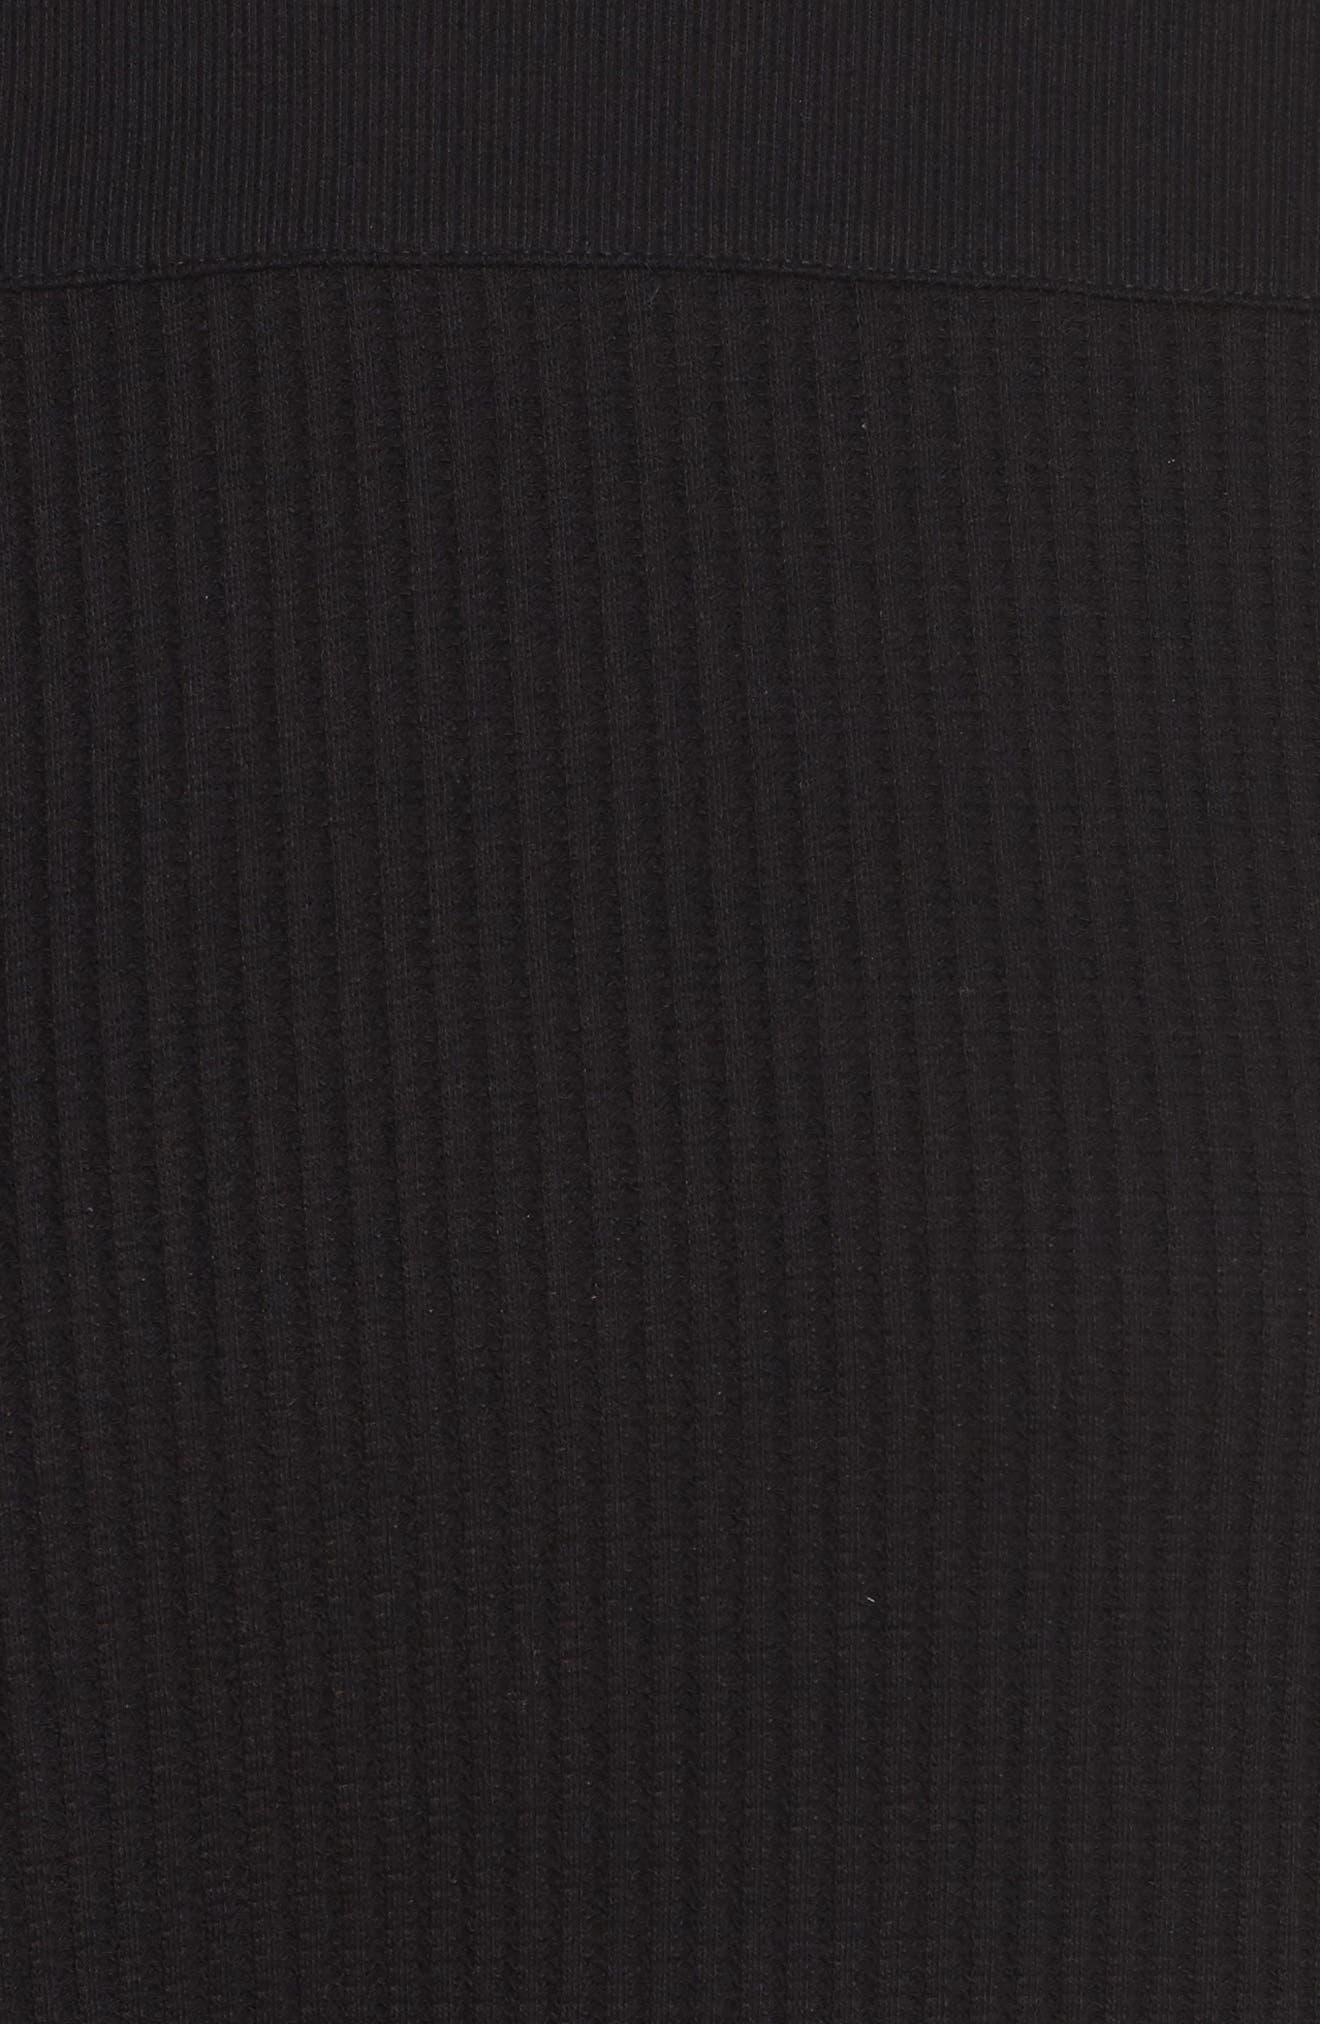 Long Sleeve Sleep Shirt,                             Alternate thumbnail 5, color,                             001